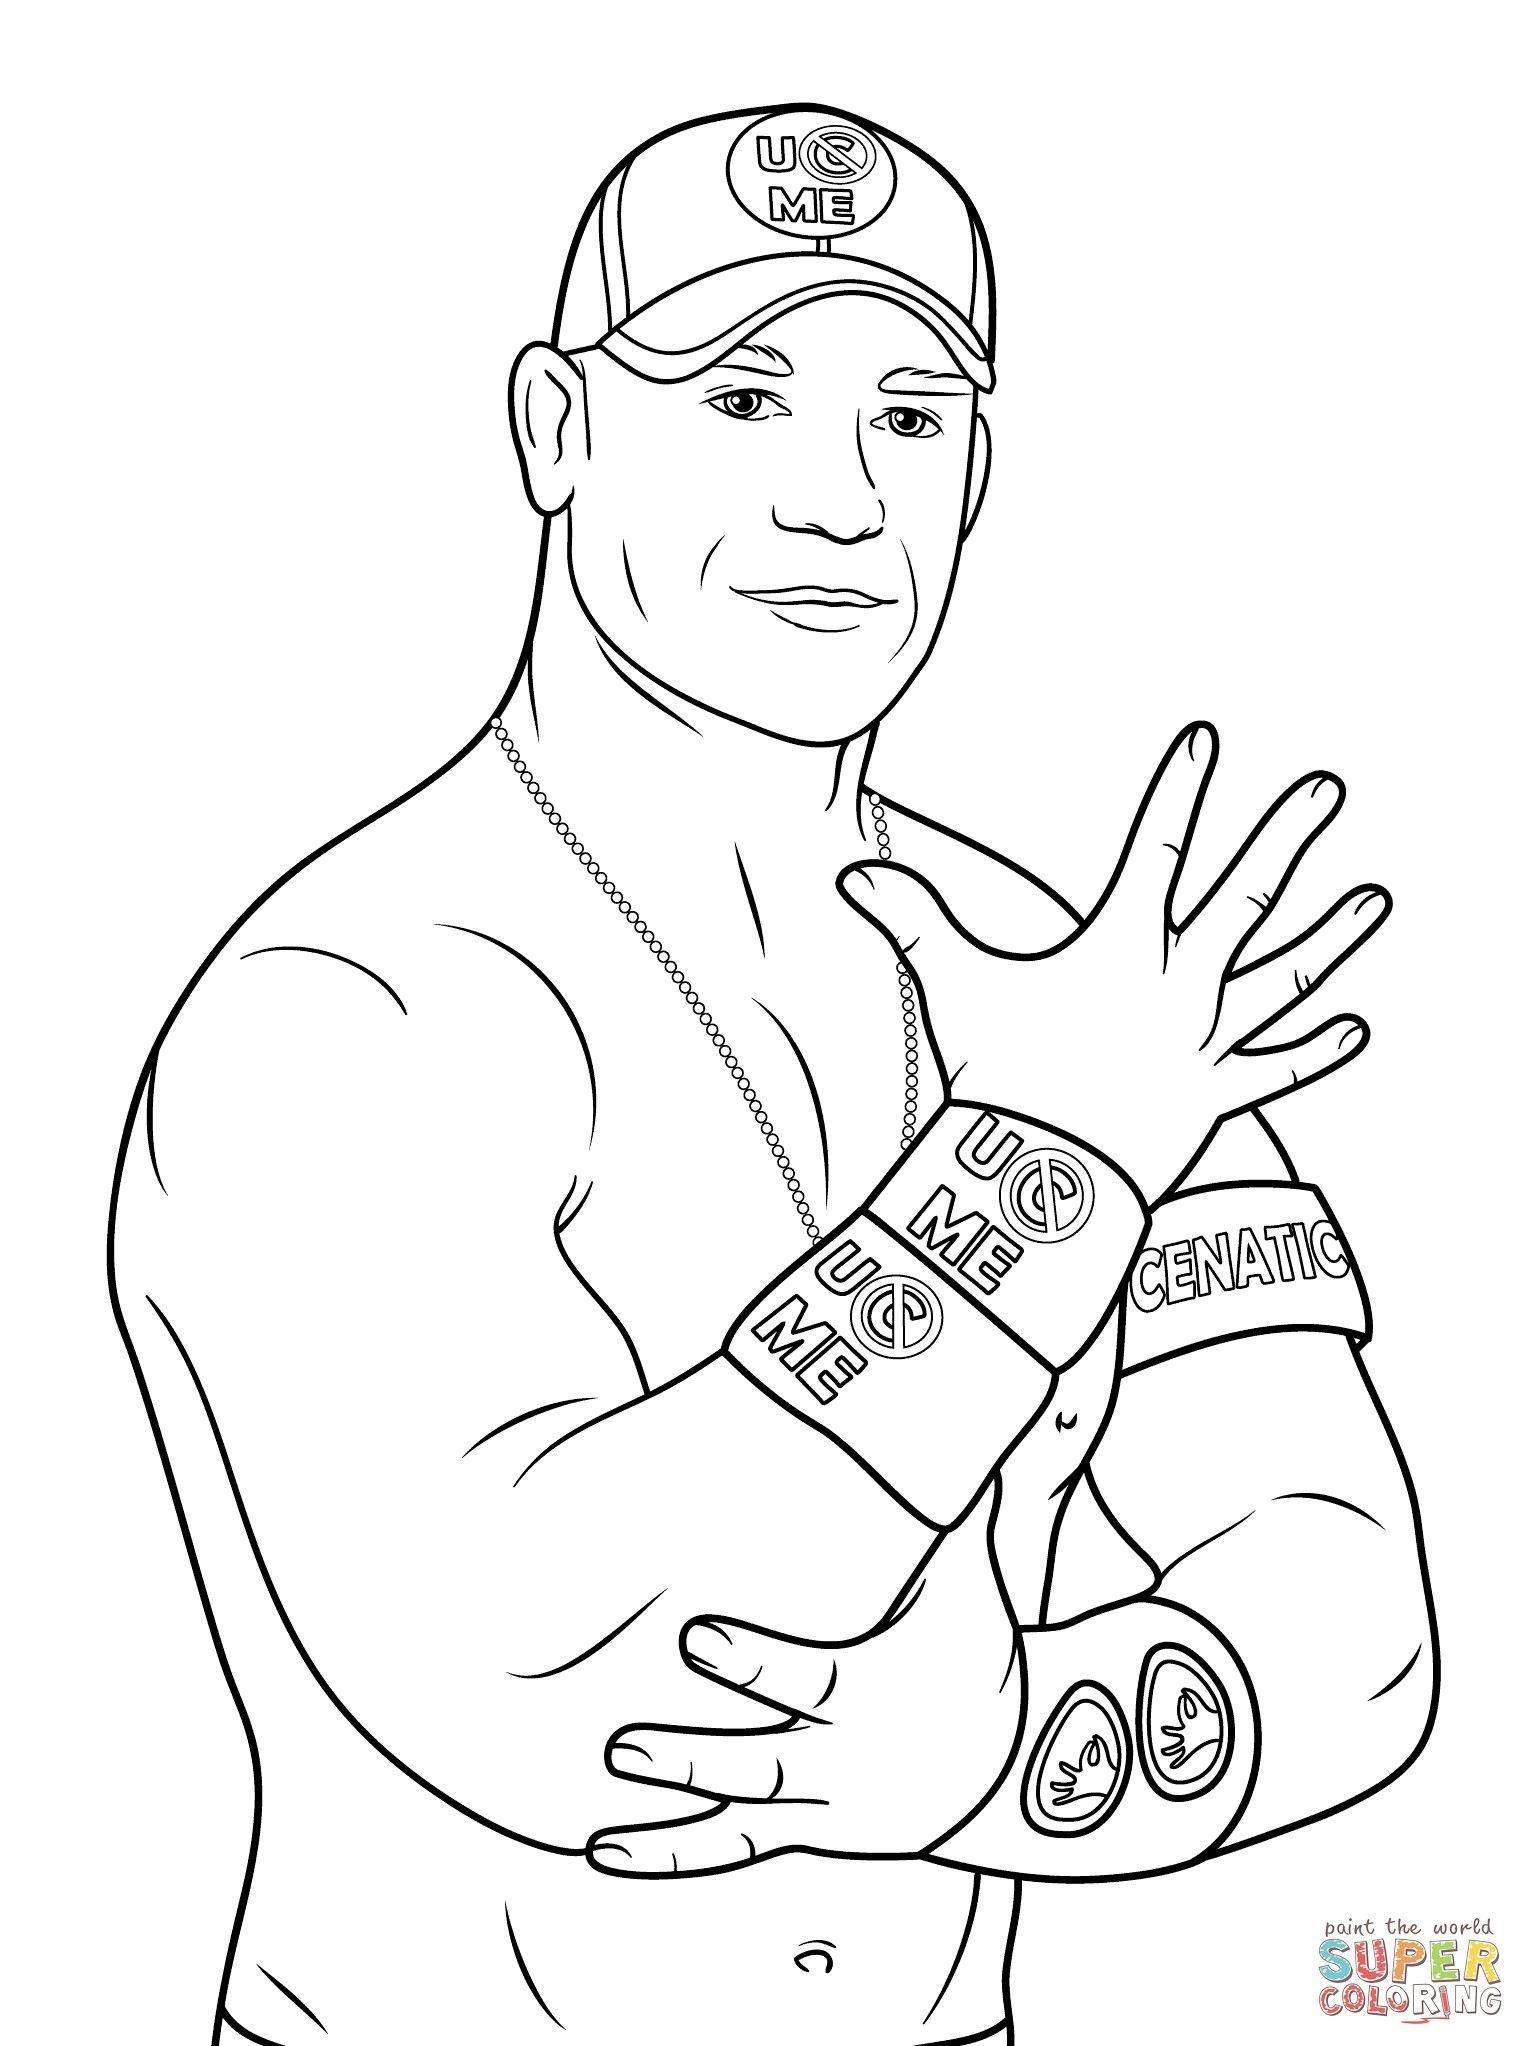 Wwe Coloring Pages John Cena Printable Wwe Coloring Pages Superhero Coloring Pages Coloring Pages To Print